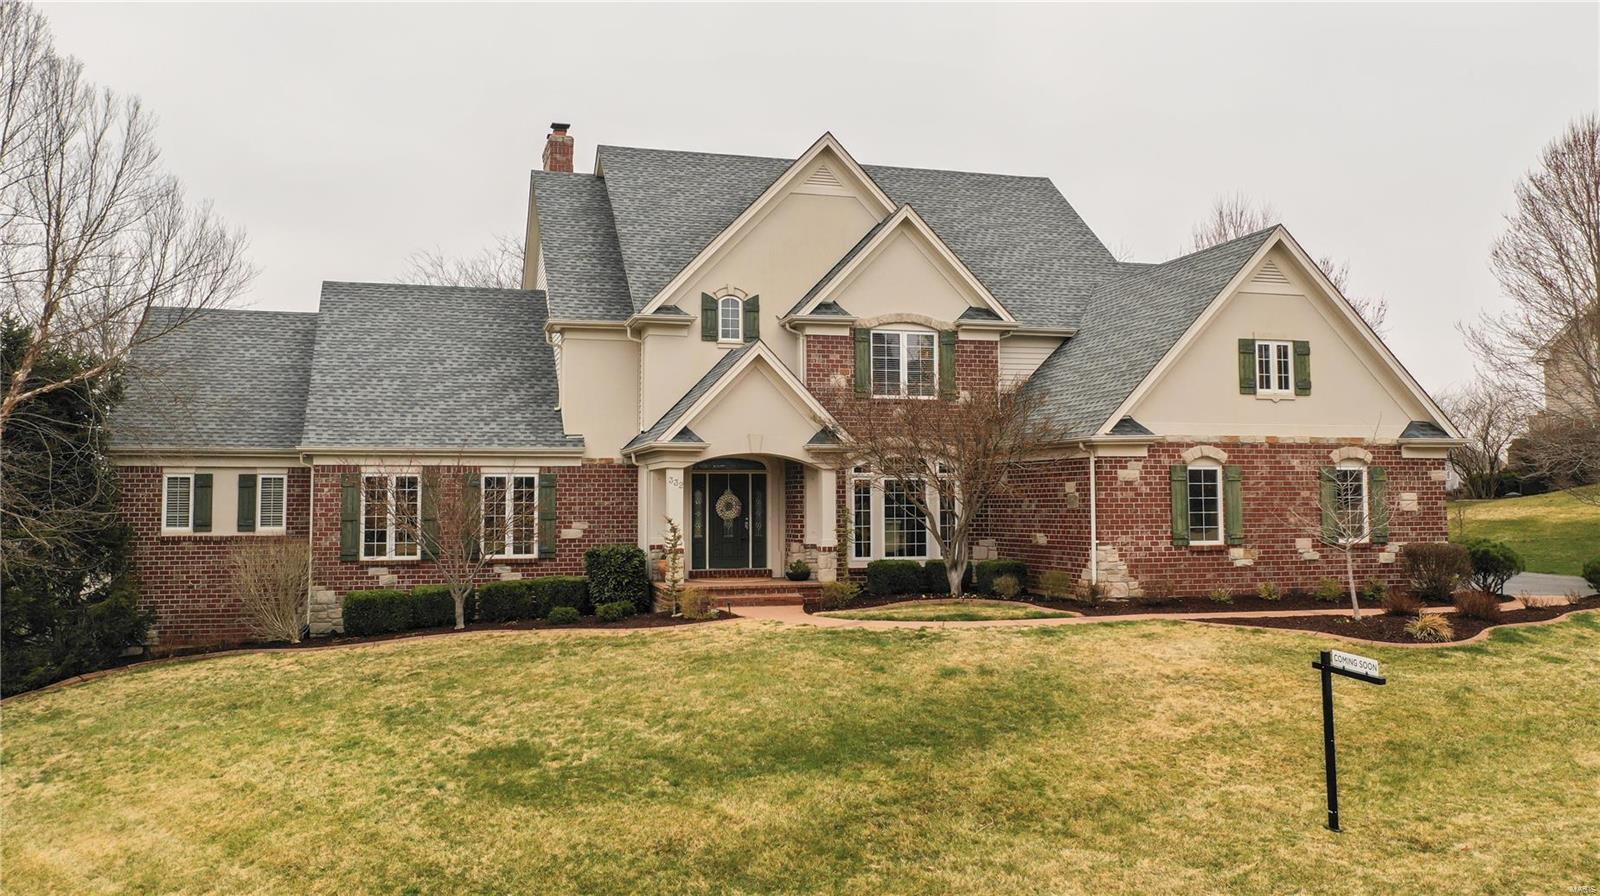 332 Barn Side Property Photo - Eureka, MO real estate listing